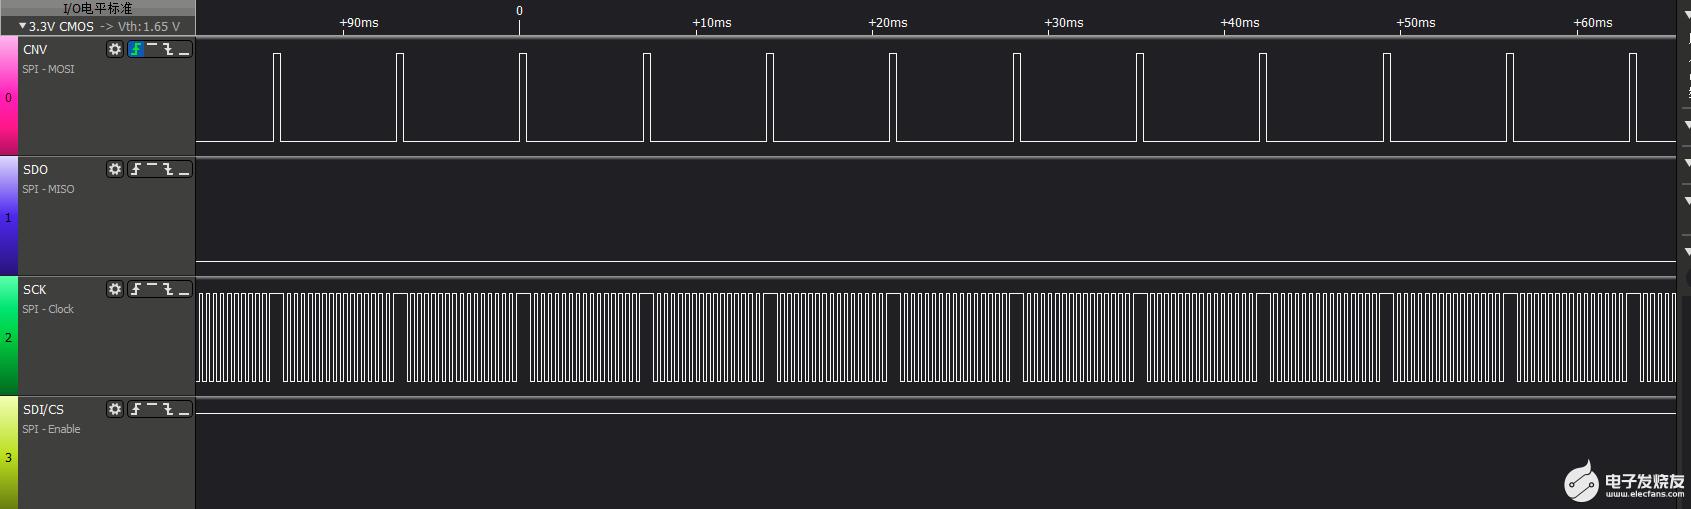 AD7916采集不到电压,SDO输出一直是低电平,使用STM32平台